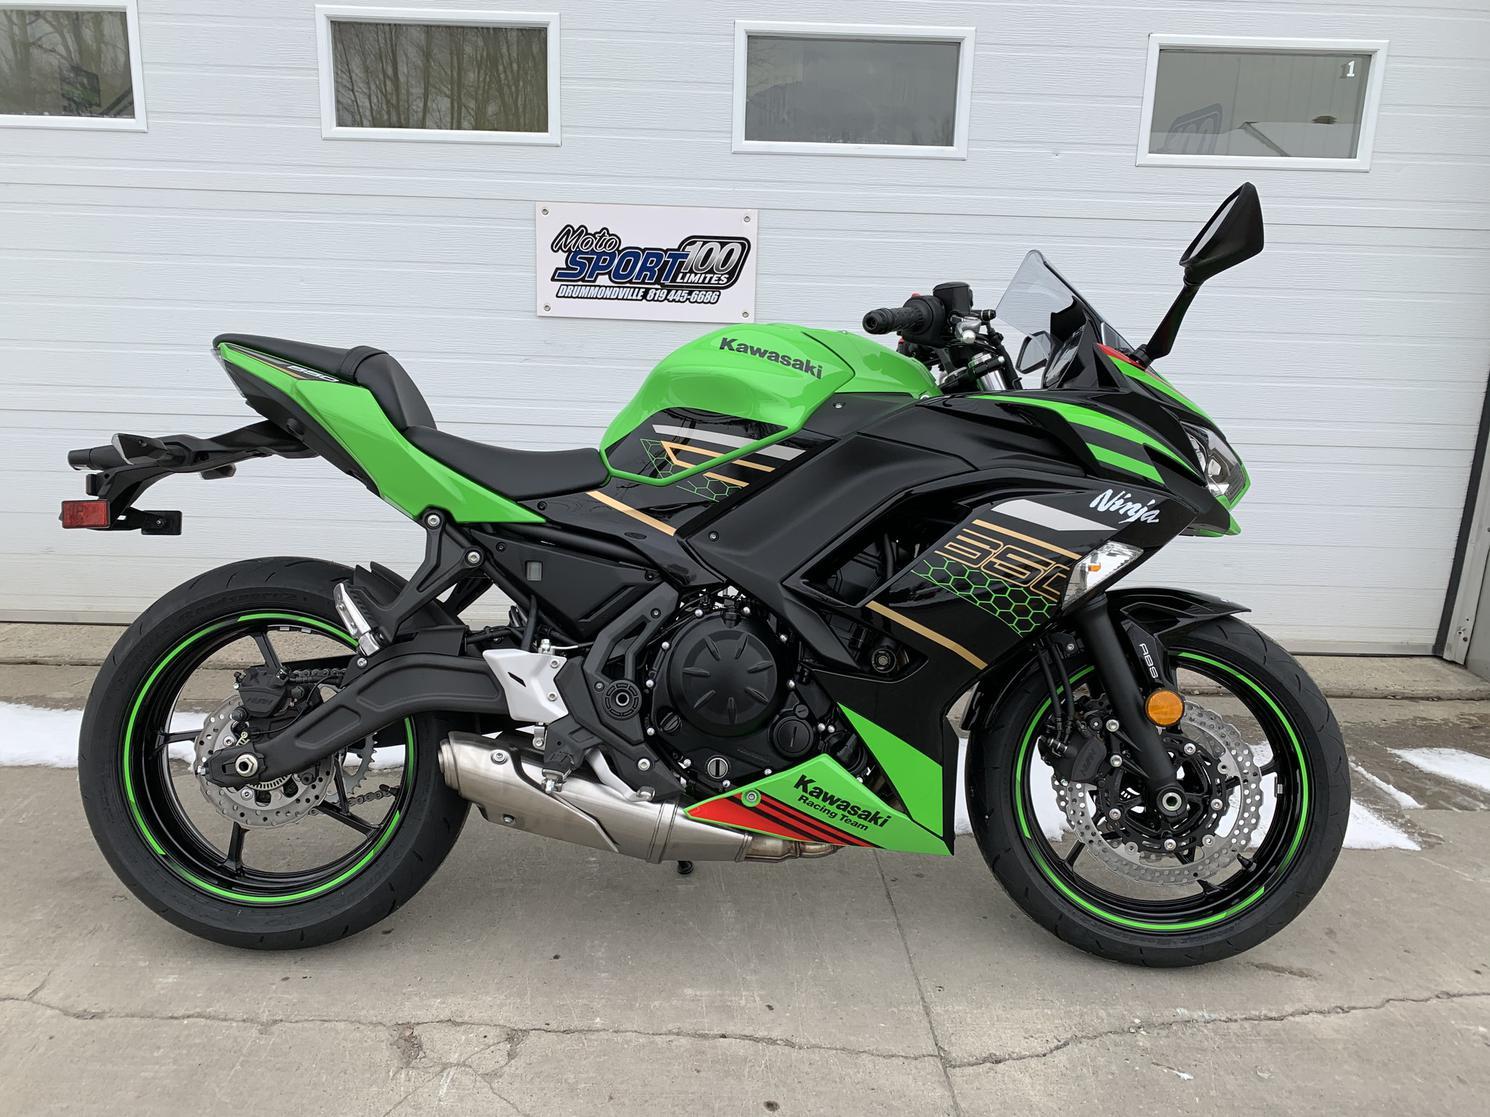 Kawasaki NINJA 650 ABS KRT 2020